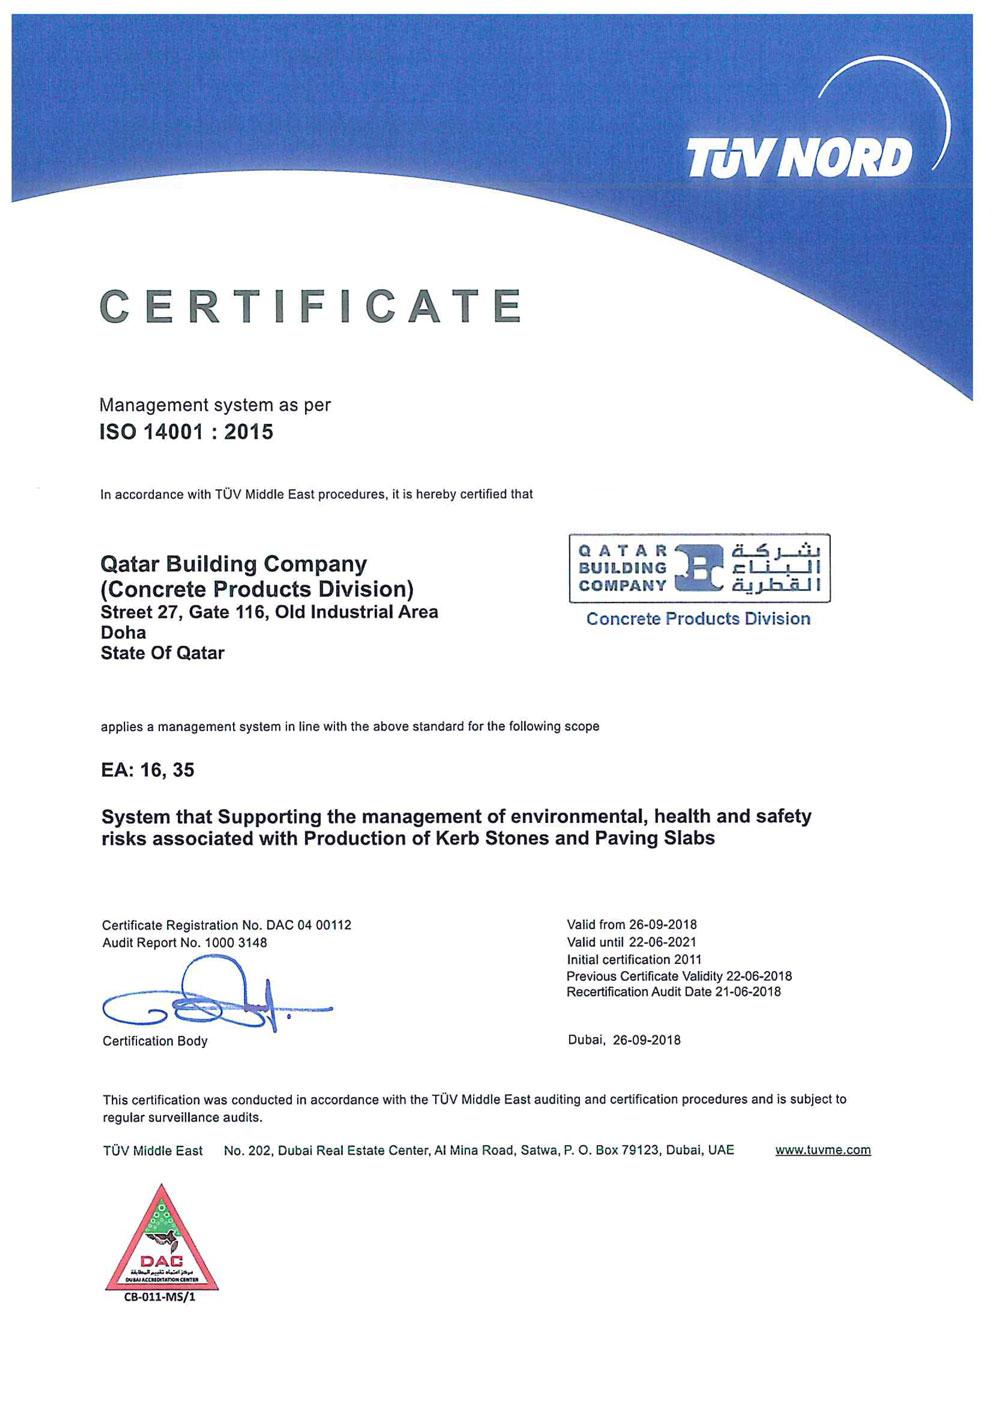 Qatar-Building-Company-ISO-14001-2015